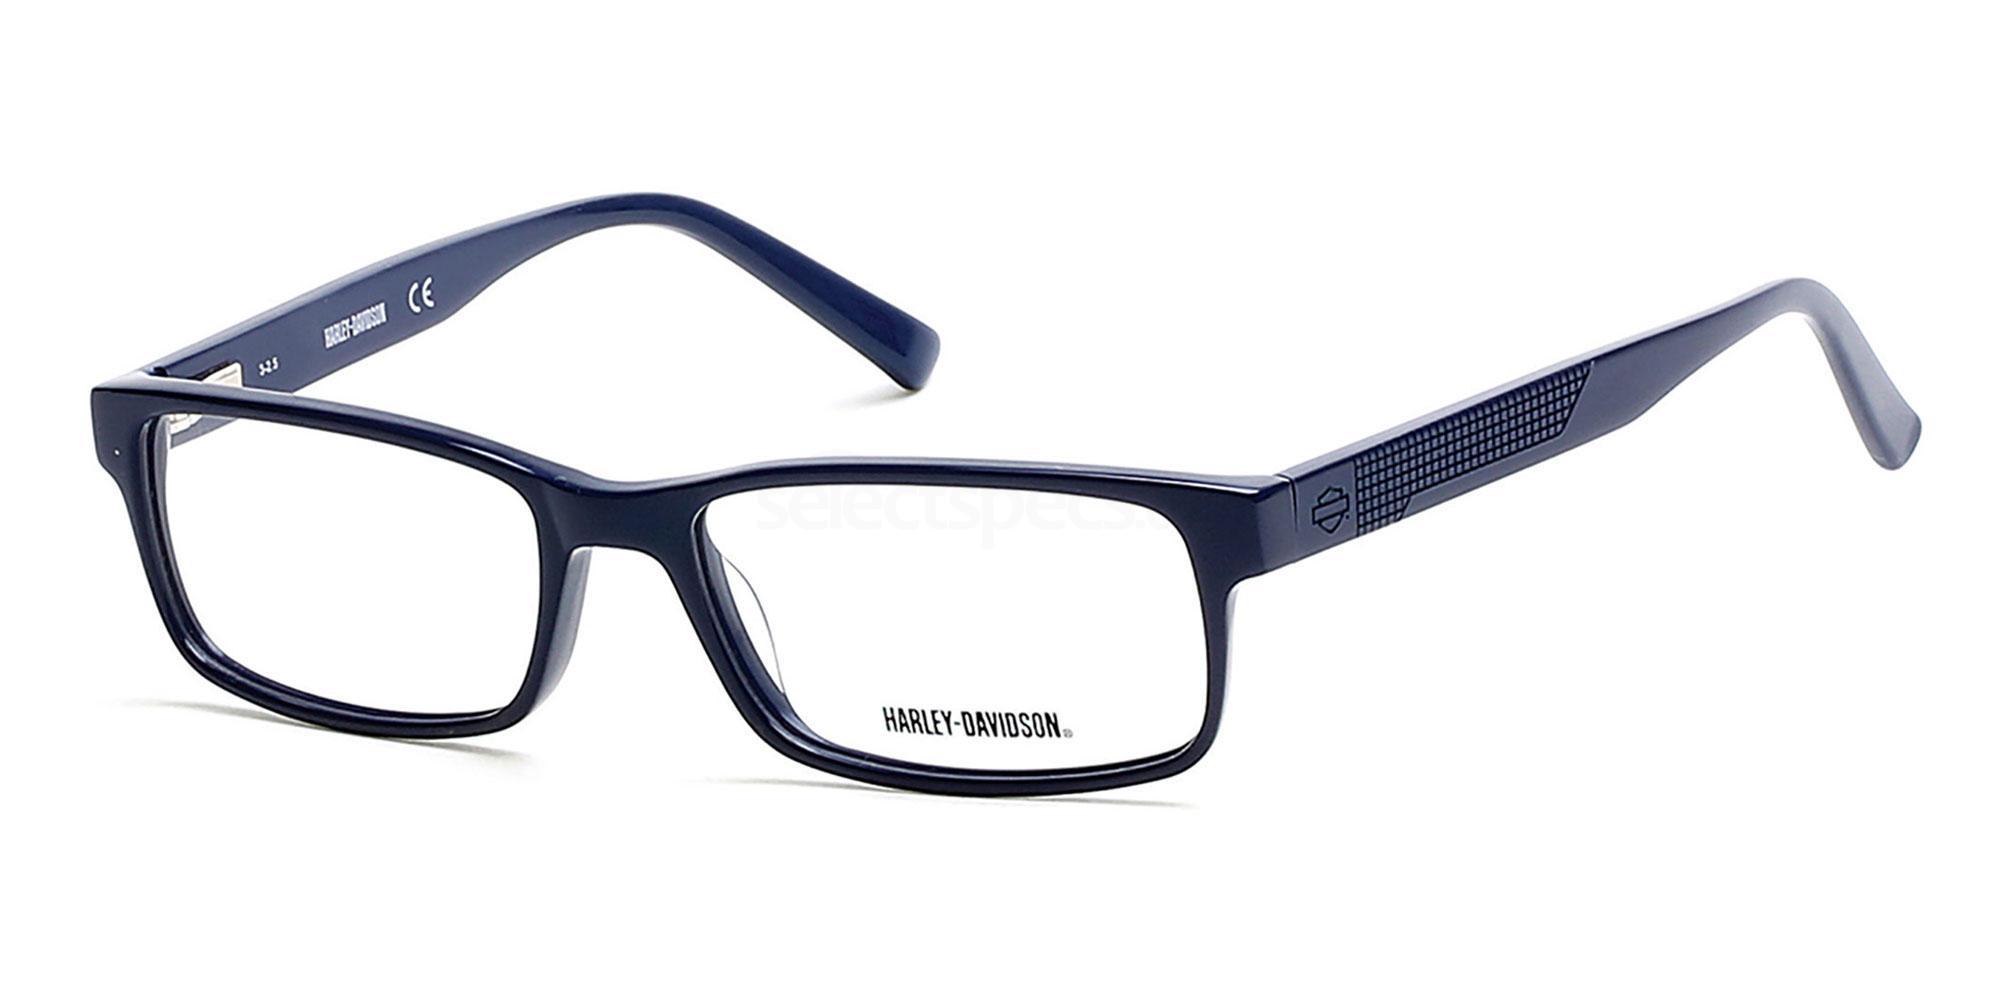 090 HD 0745 Glasses, Harley Davidson